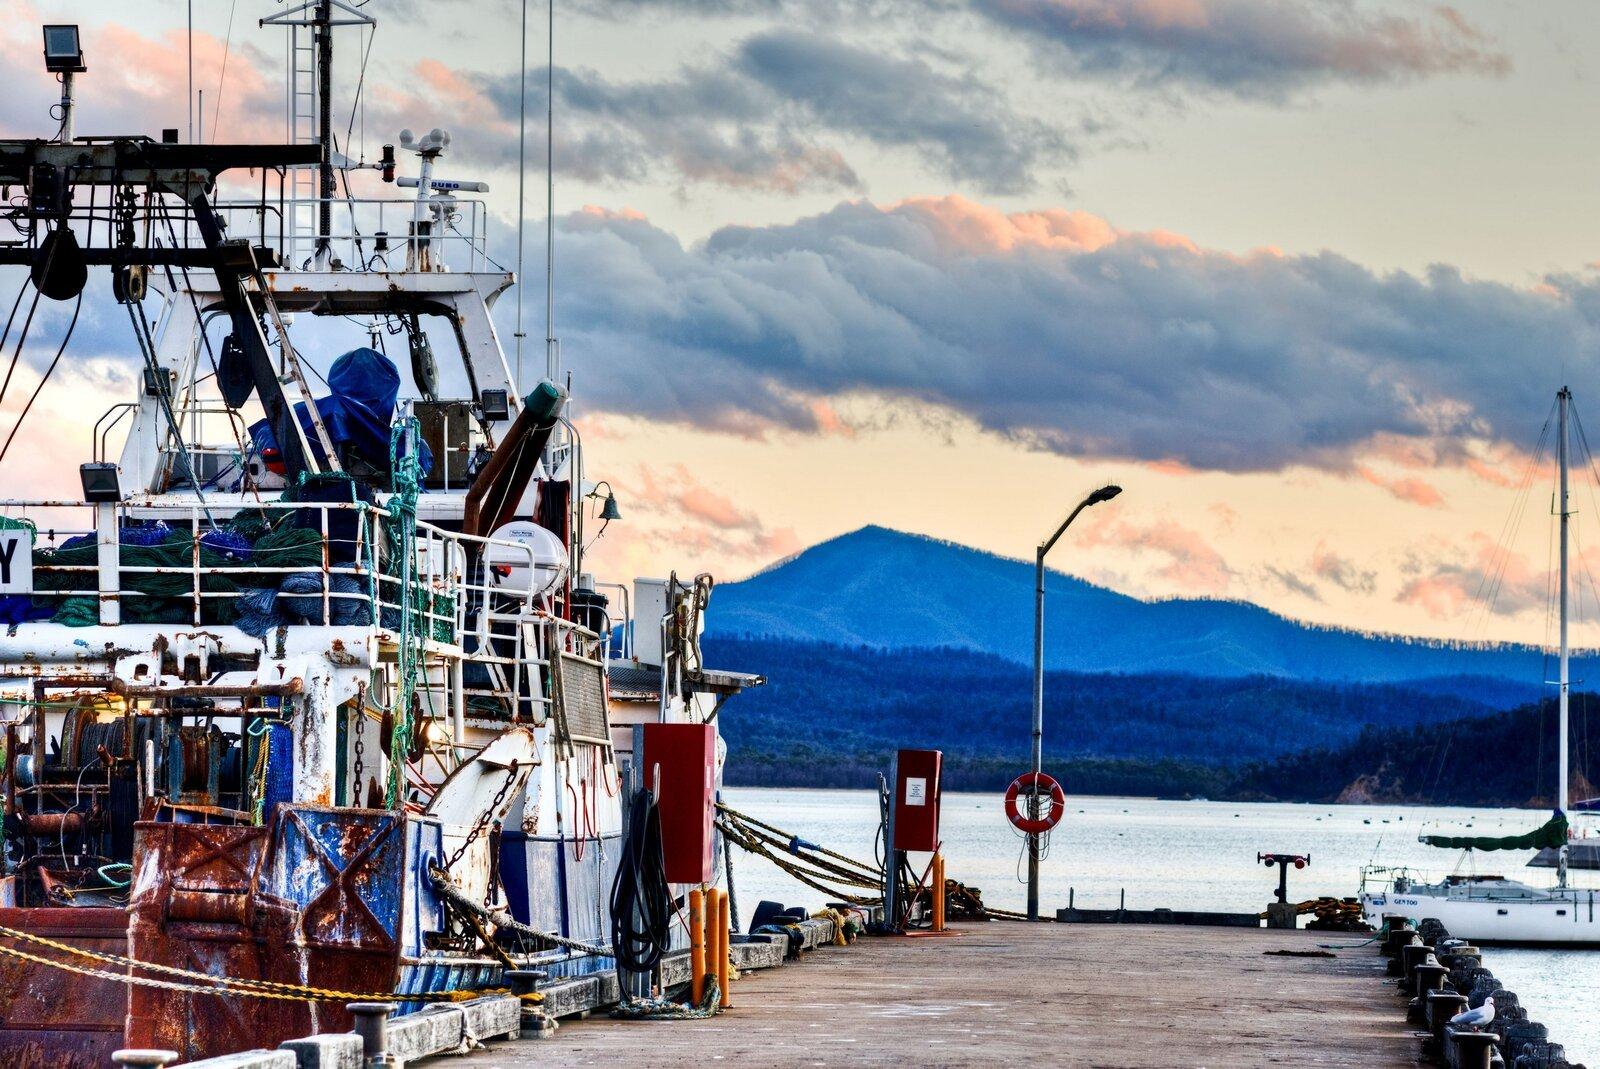 Fishing boat and Mount Imlay – Balawan_s_j.jpg